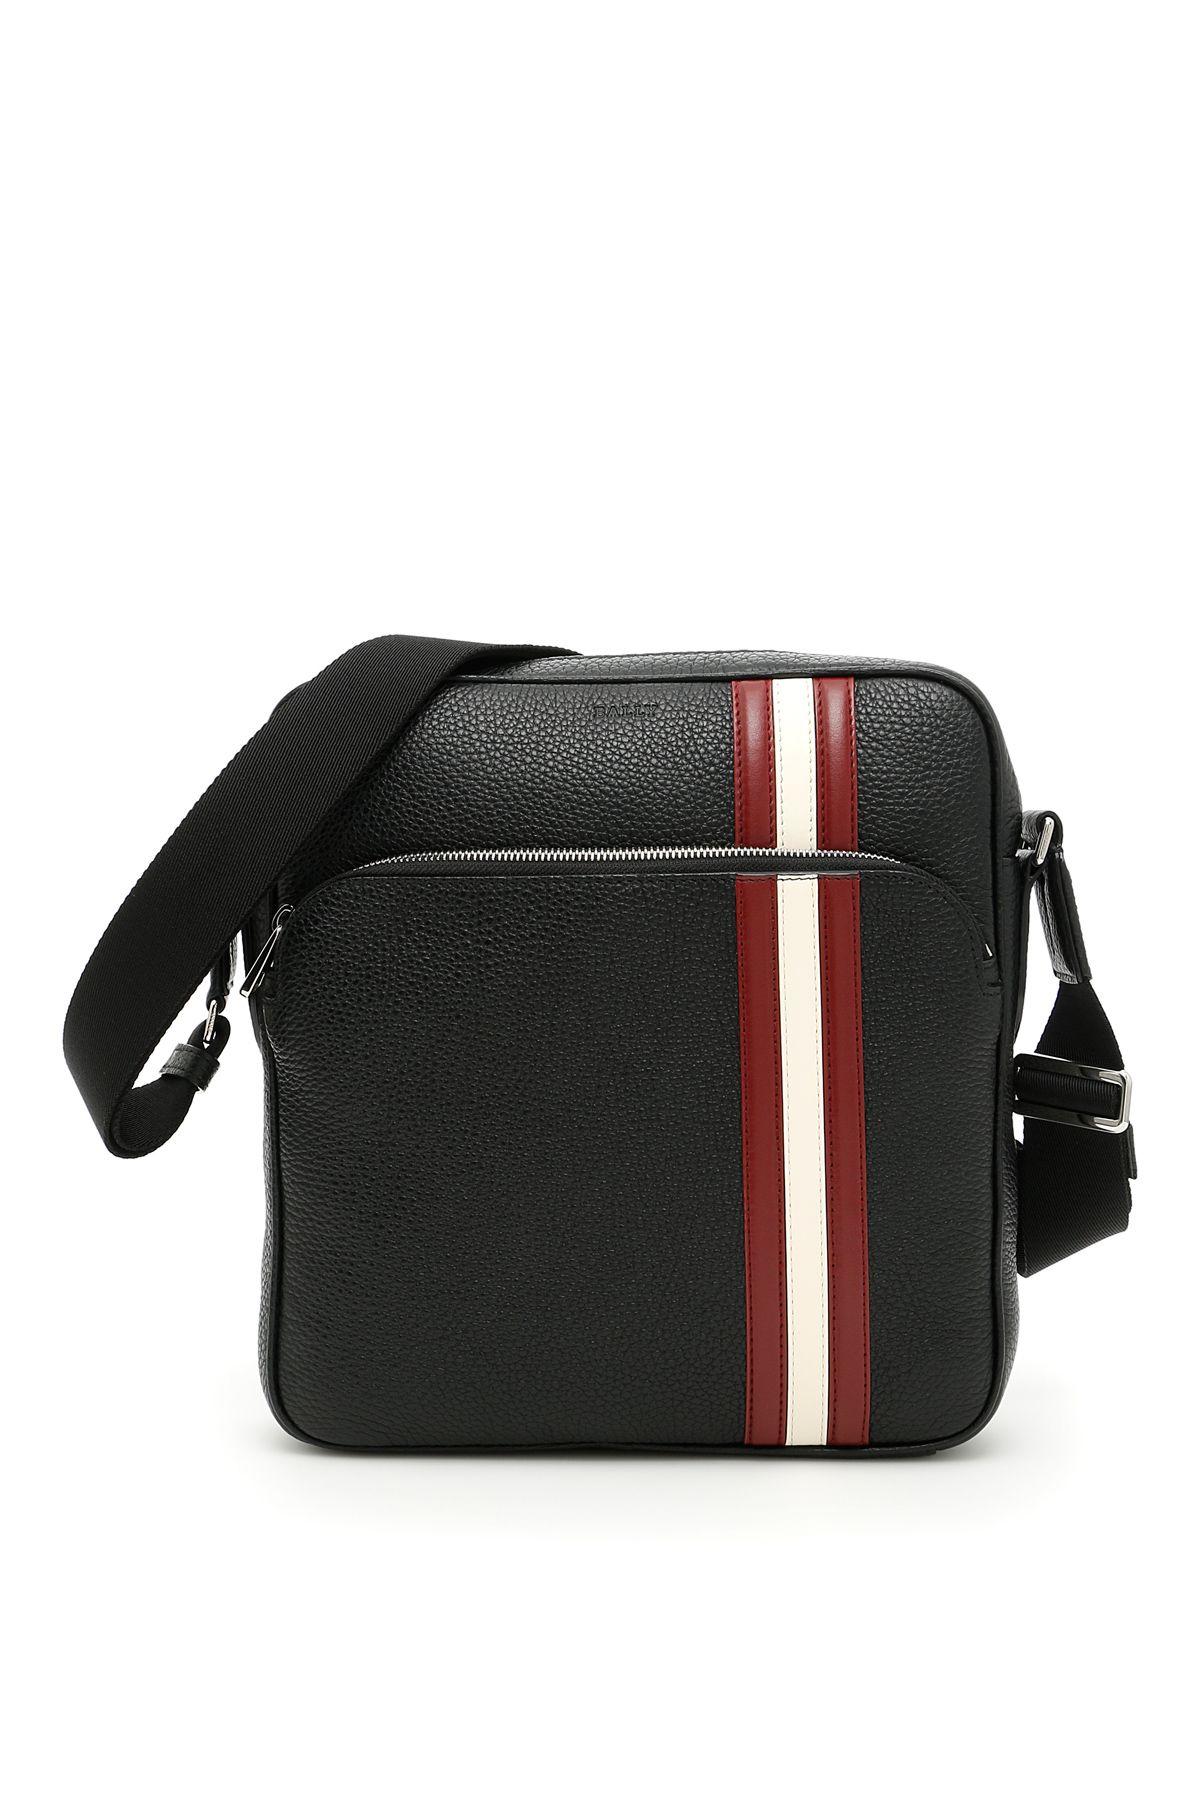 Sorel Bag